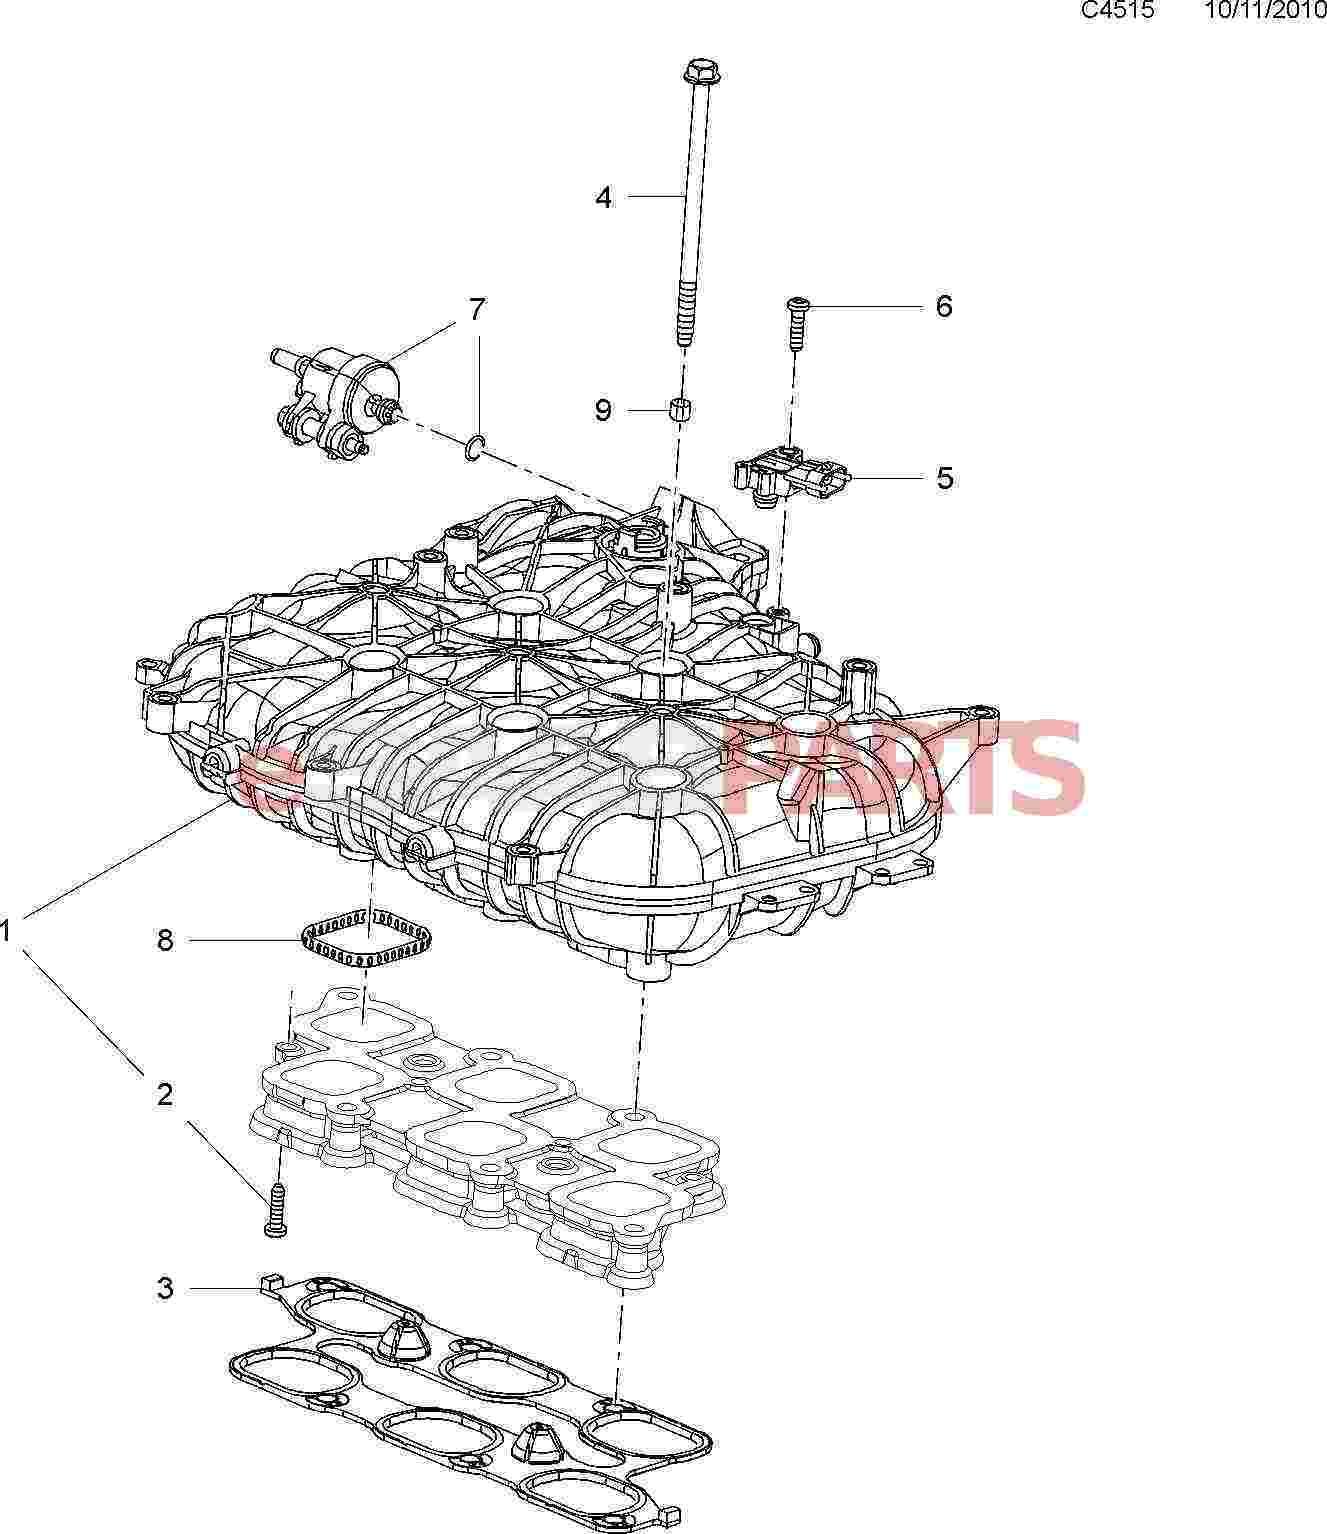 Saab 9 5 3.0 Engine Diagram Jazzmaster Wiring Diagram 50 S